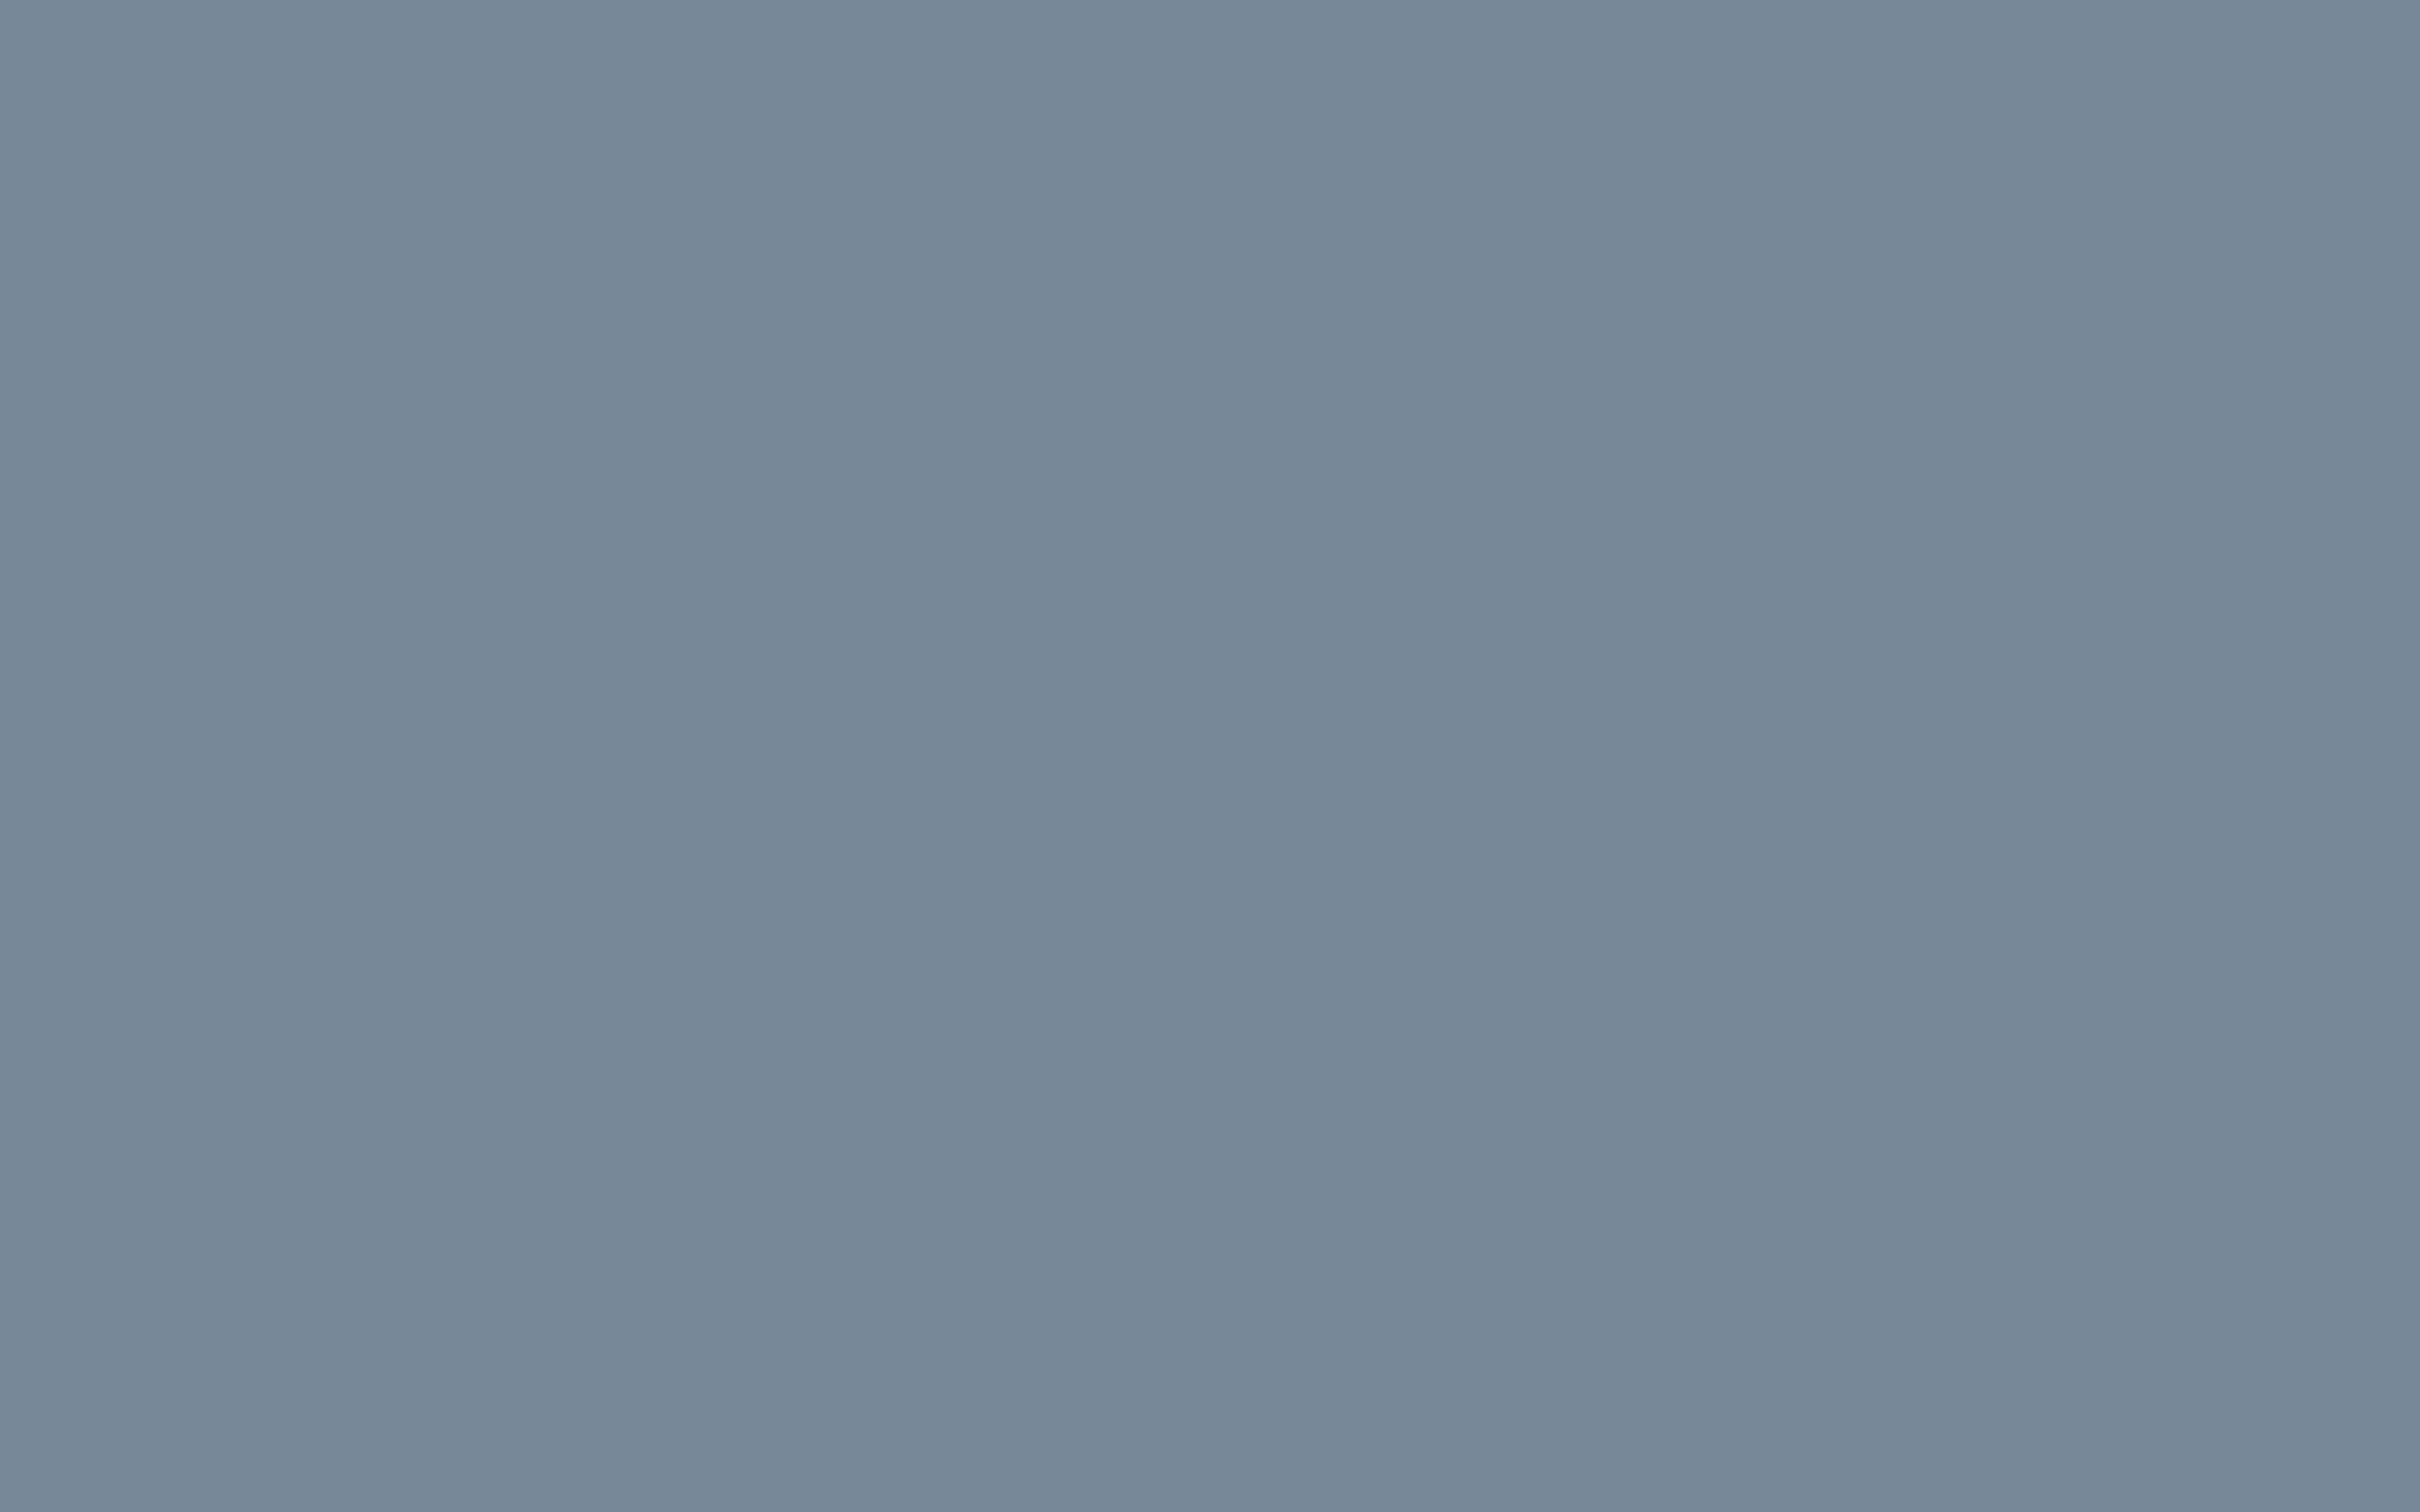 Grey Slate Background Gray Slate Wallpaper -...